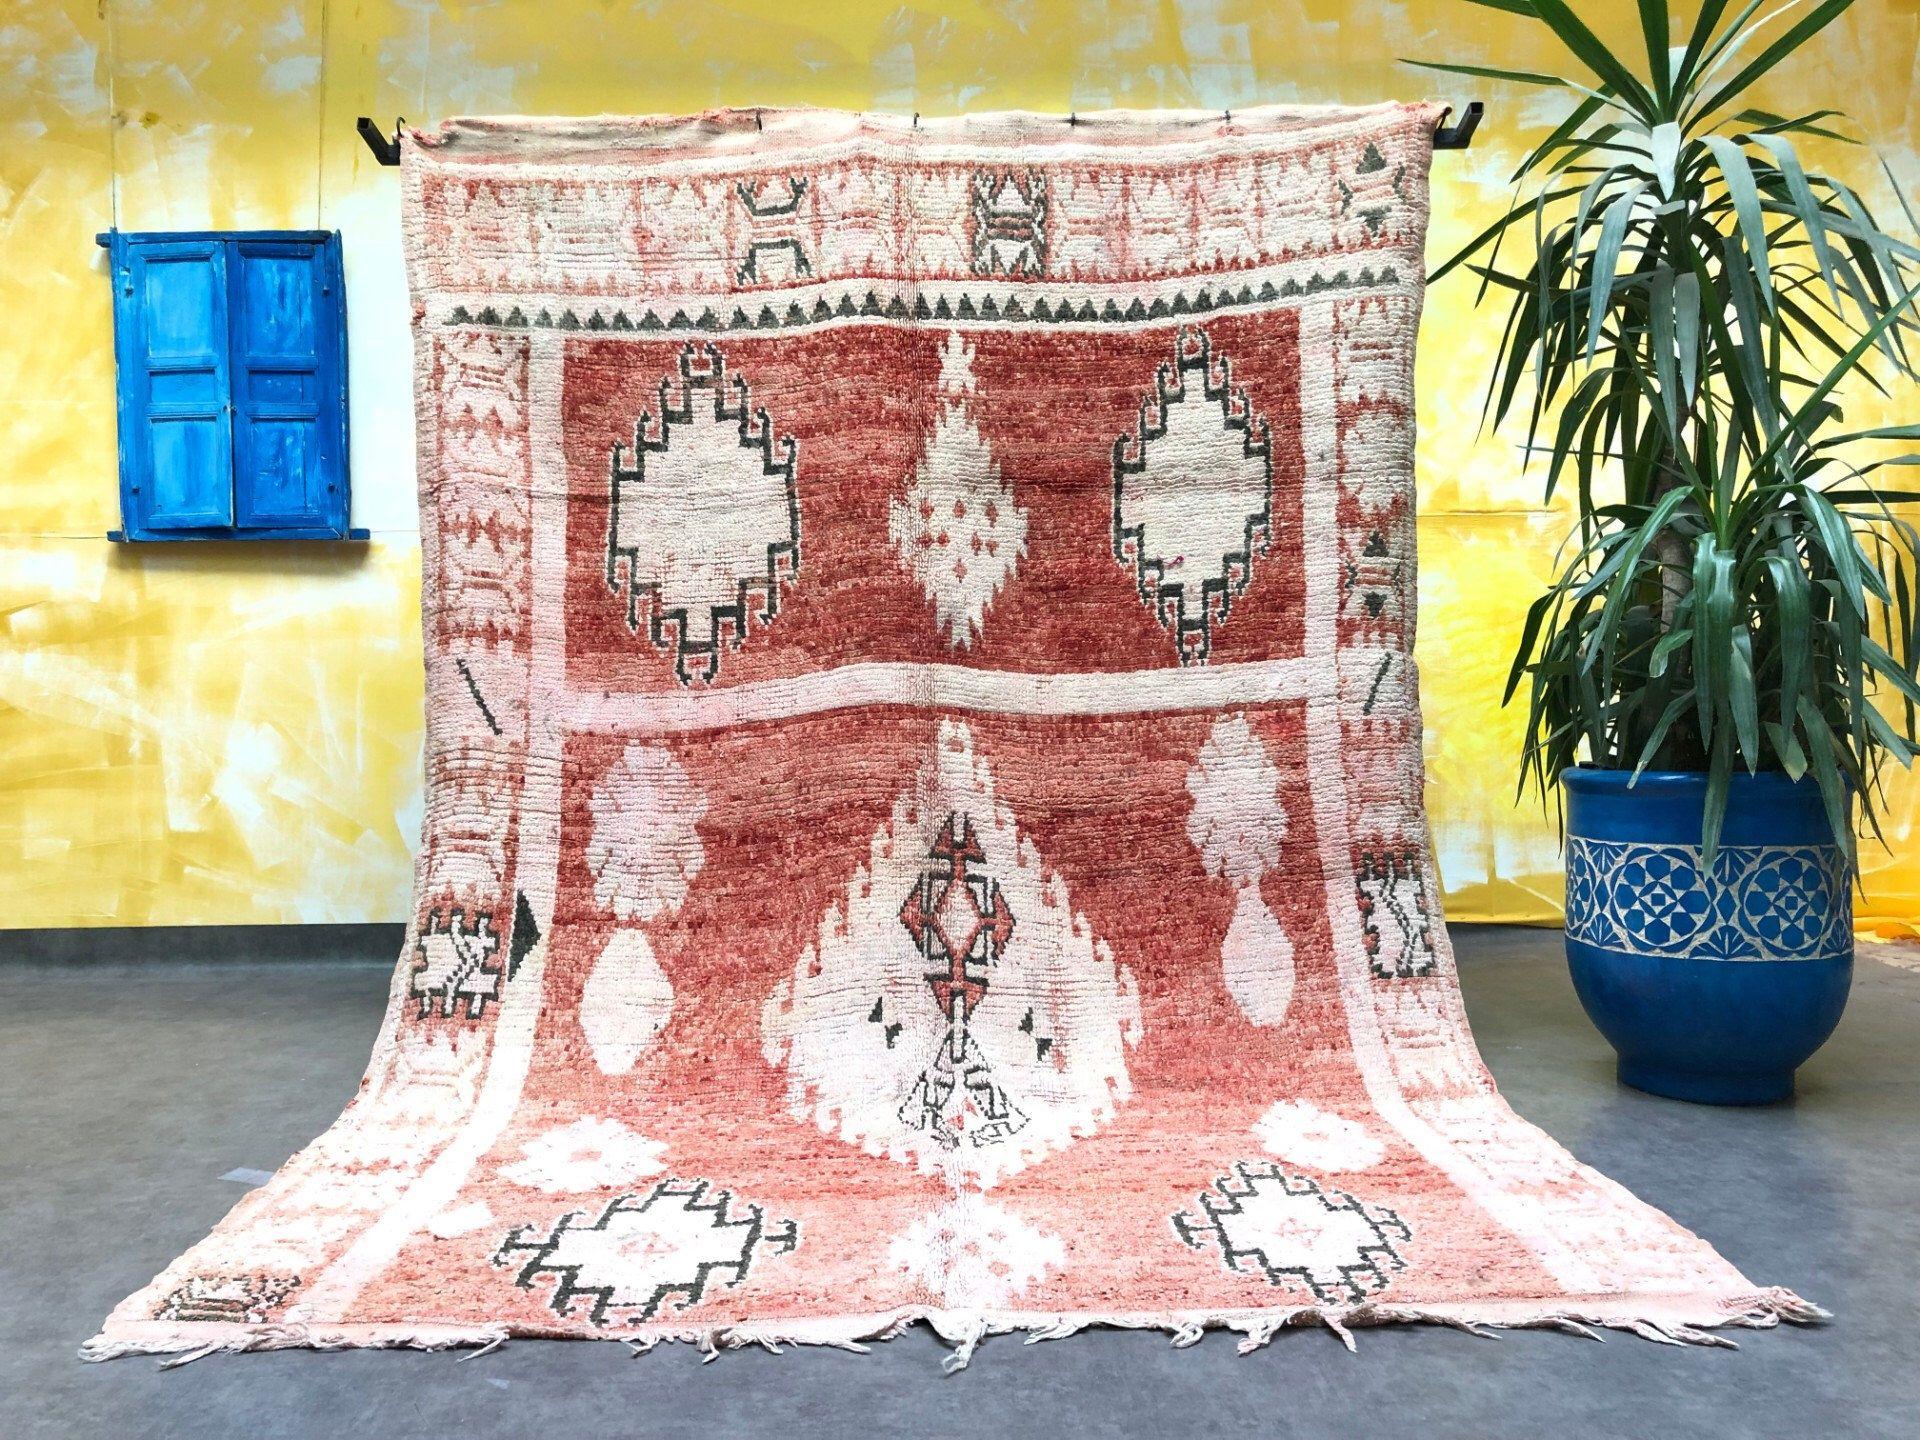 Authentic Vintage Handmade Rug 5x6 Stunning Berber Azilal Vintage Rug Morocco Decor Berber Carpet Handmade Rug Soft Vintage Carpet Boho Vintage Carpet Carpet Handmade Boho Carpets